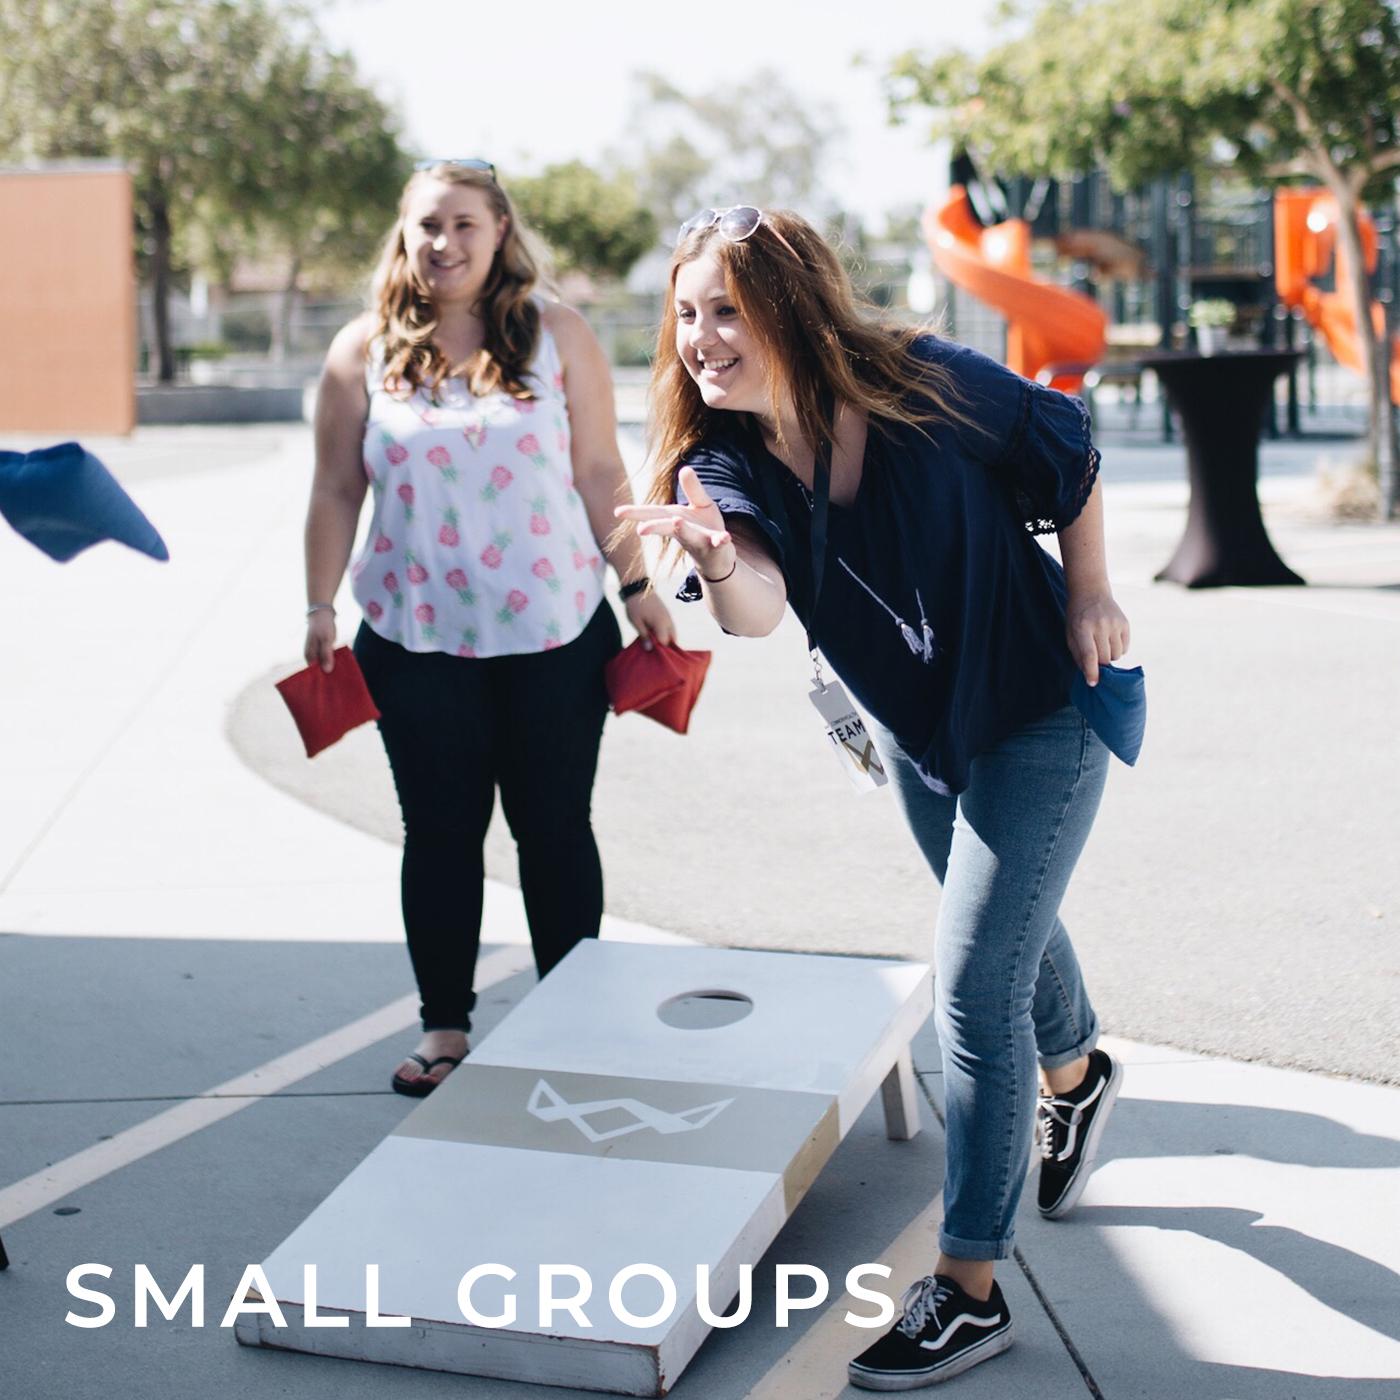 smallgroupstile.jpg